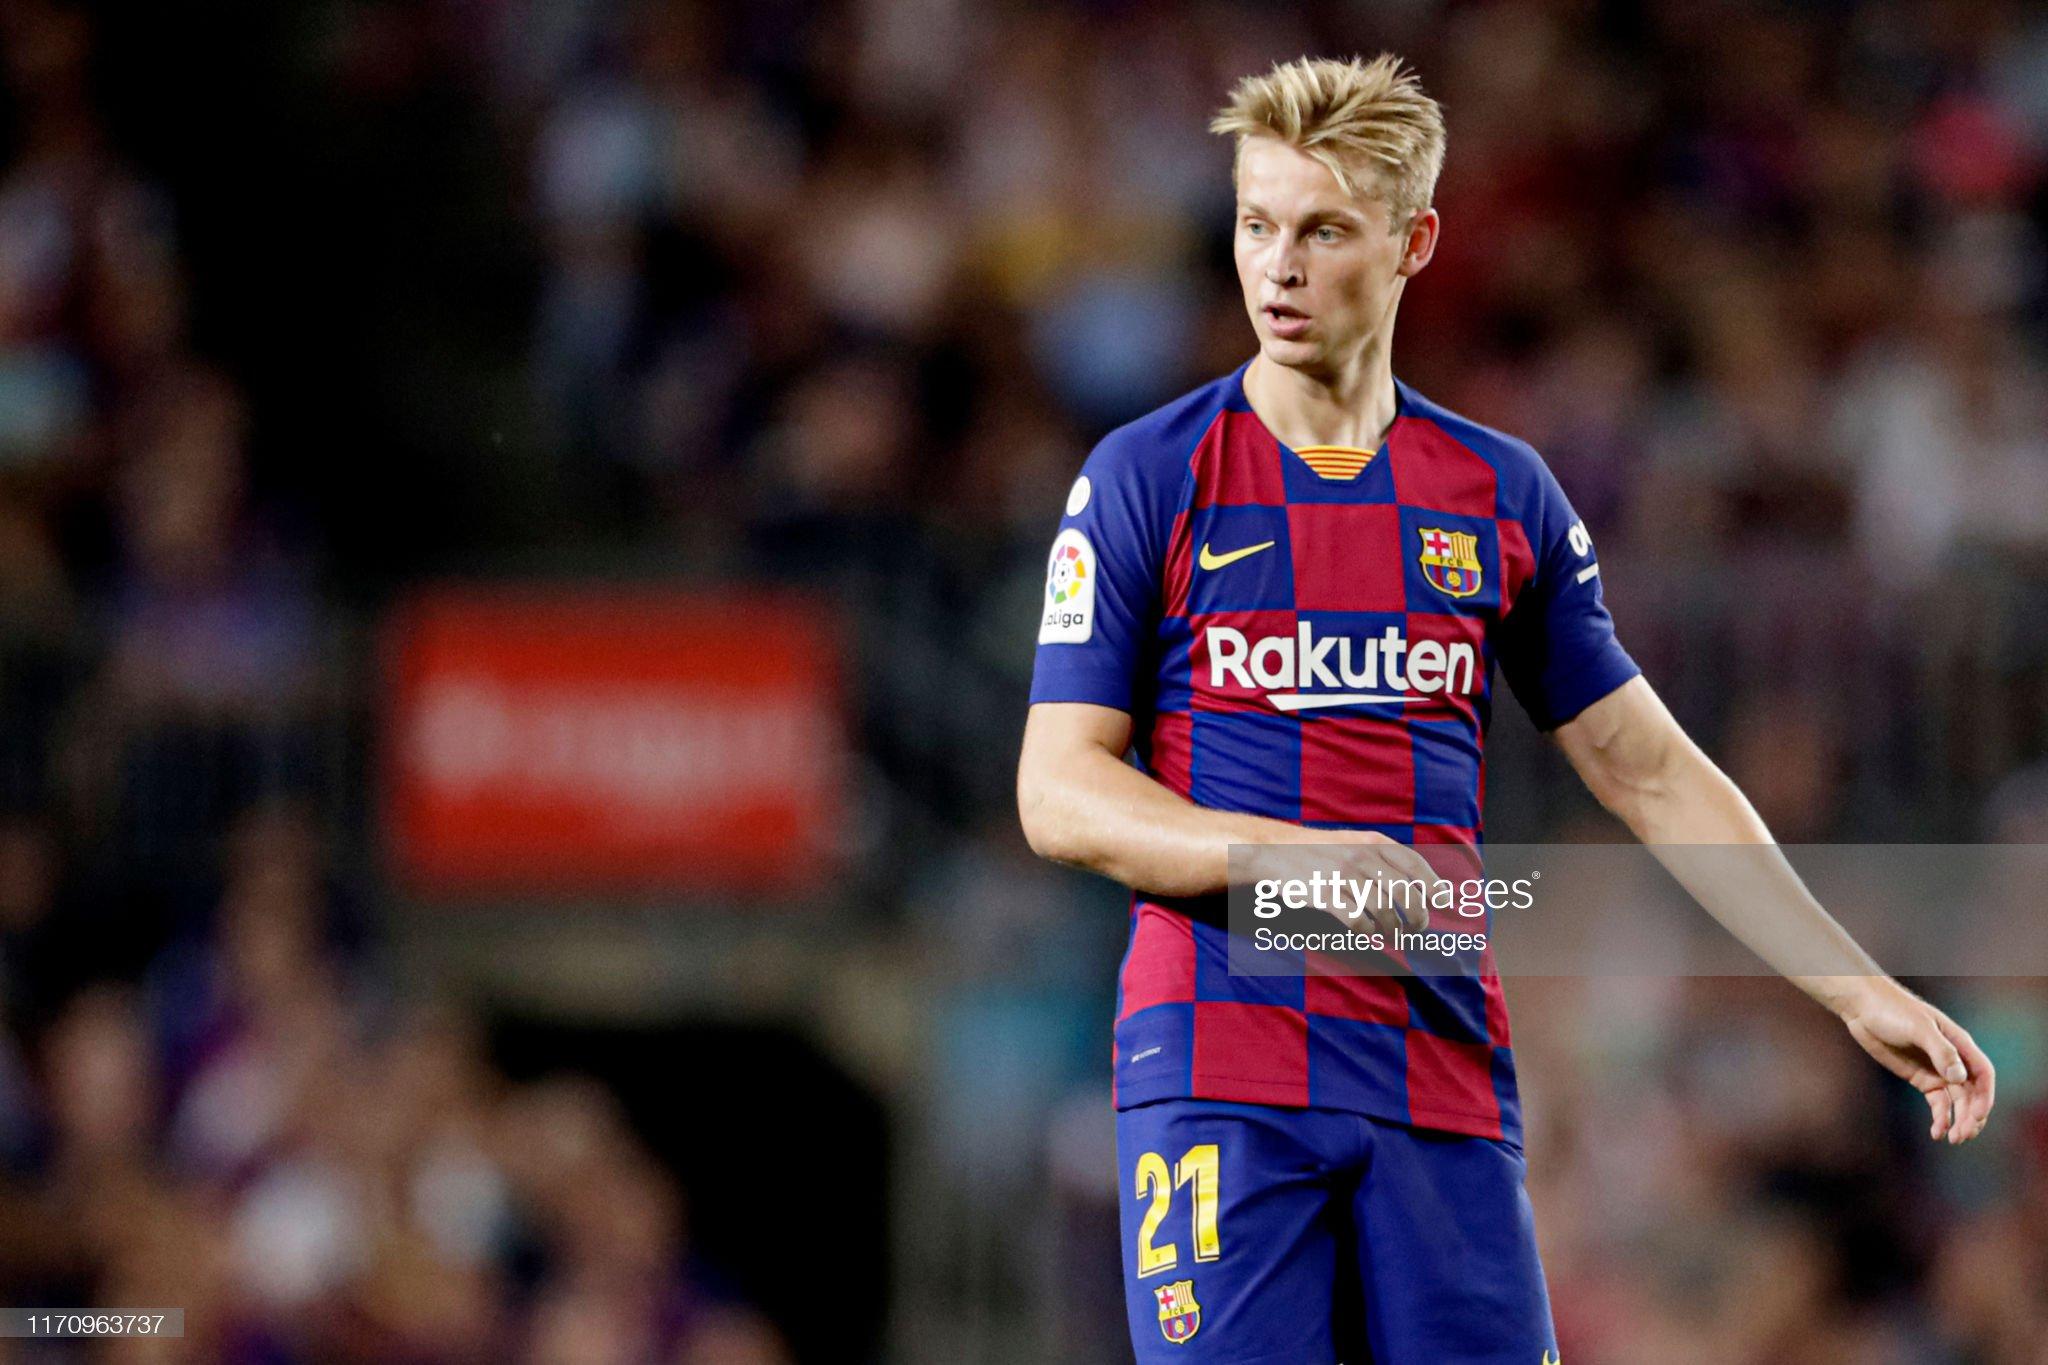 صور مباراة : برشلونة - فياريال 2-1 ( 24-09-2019 )  Frenkie-de-jong-of-fc-barcelona-during-the-la-liga-santander-match-picture-id1170963737?s=2048x2048